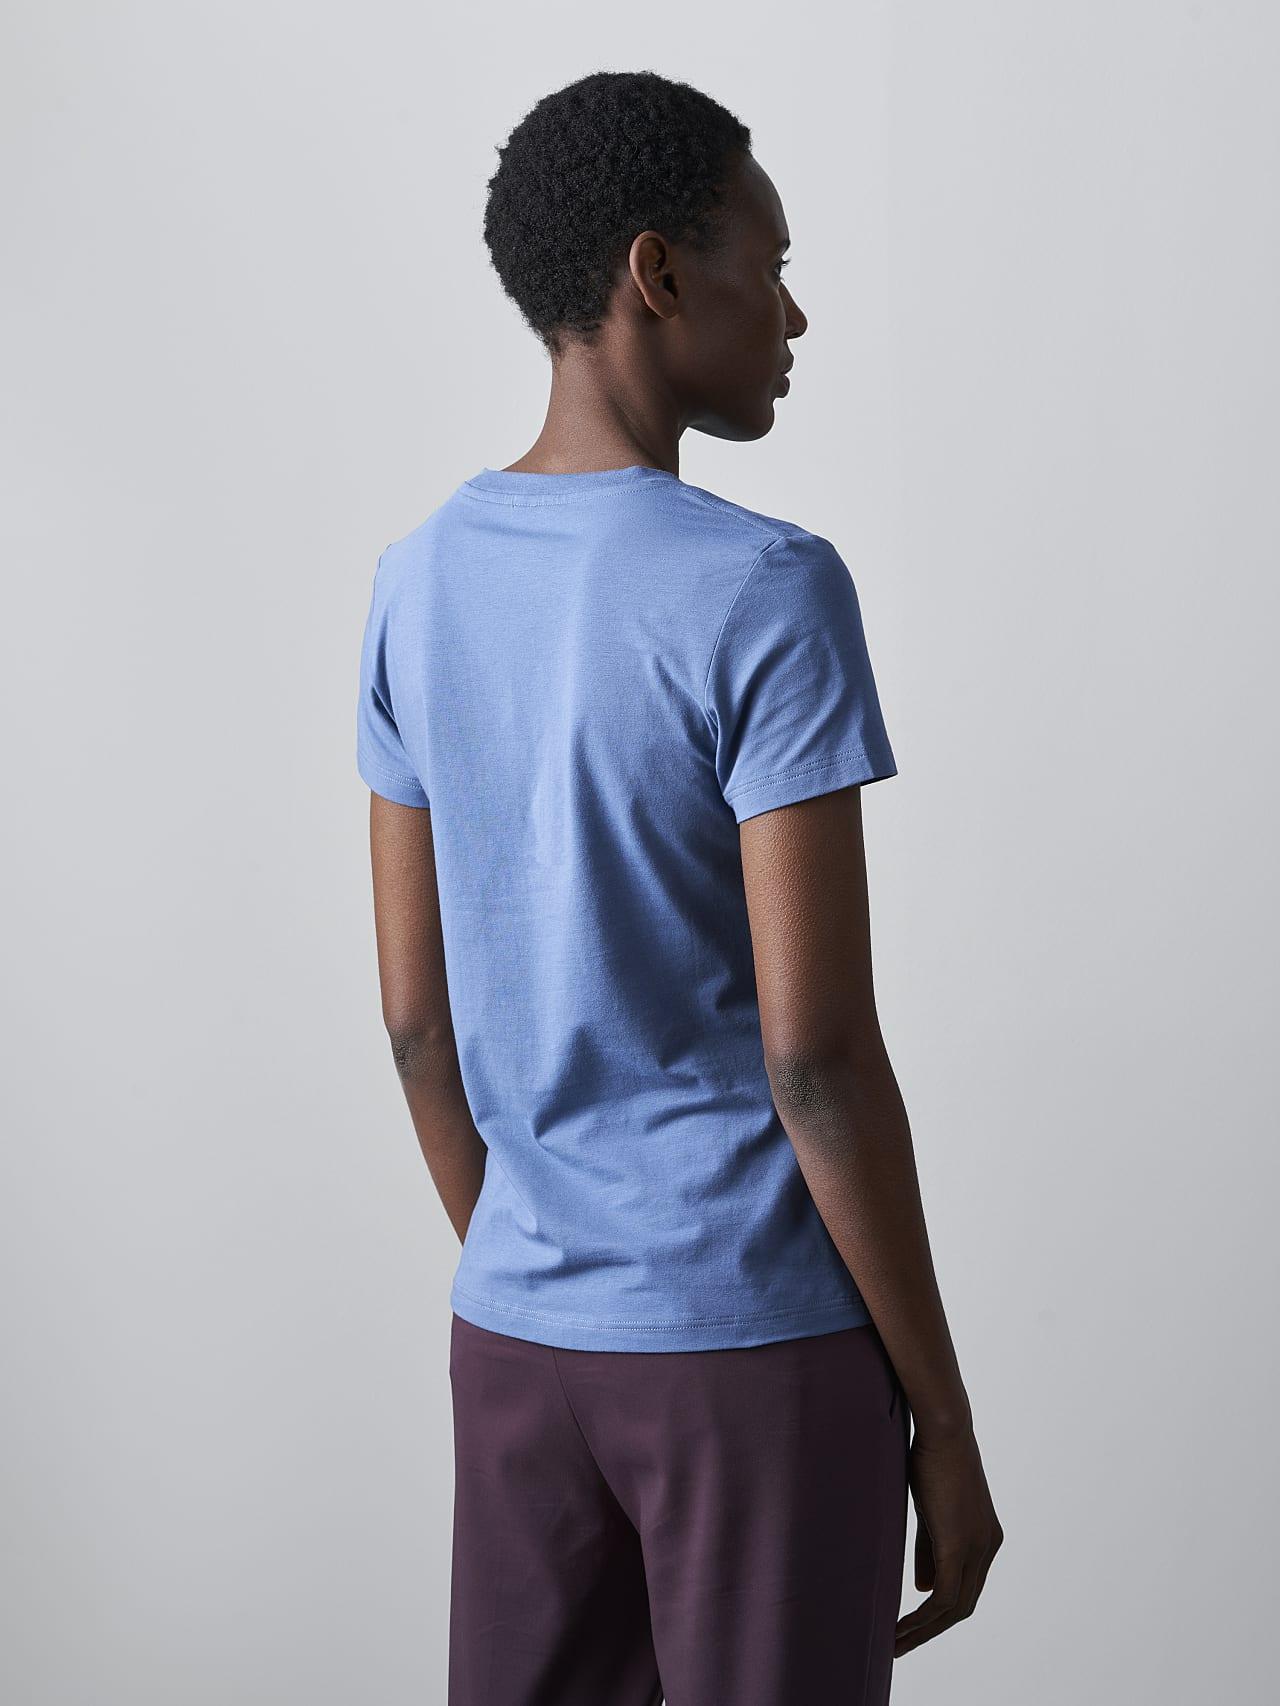 JANPA V1.Y5.02 Logo Print T-Shirt light blue Front Main Alpha Tauri